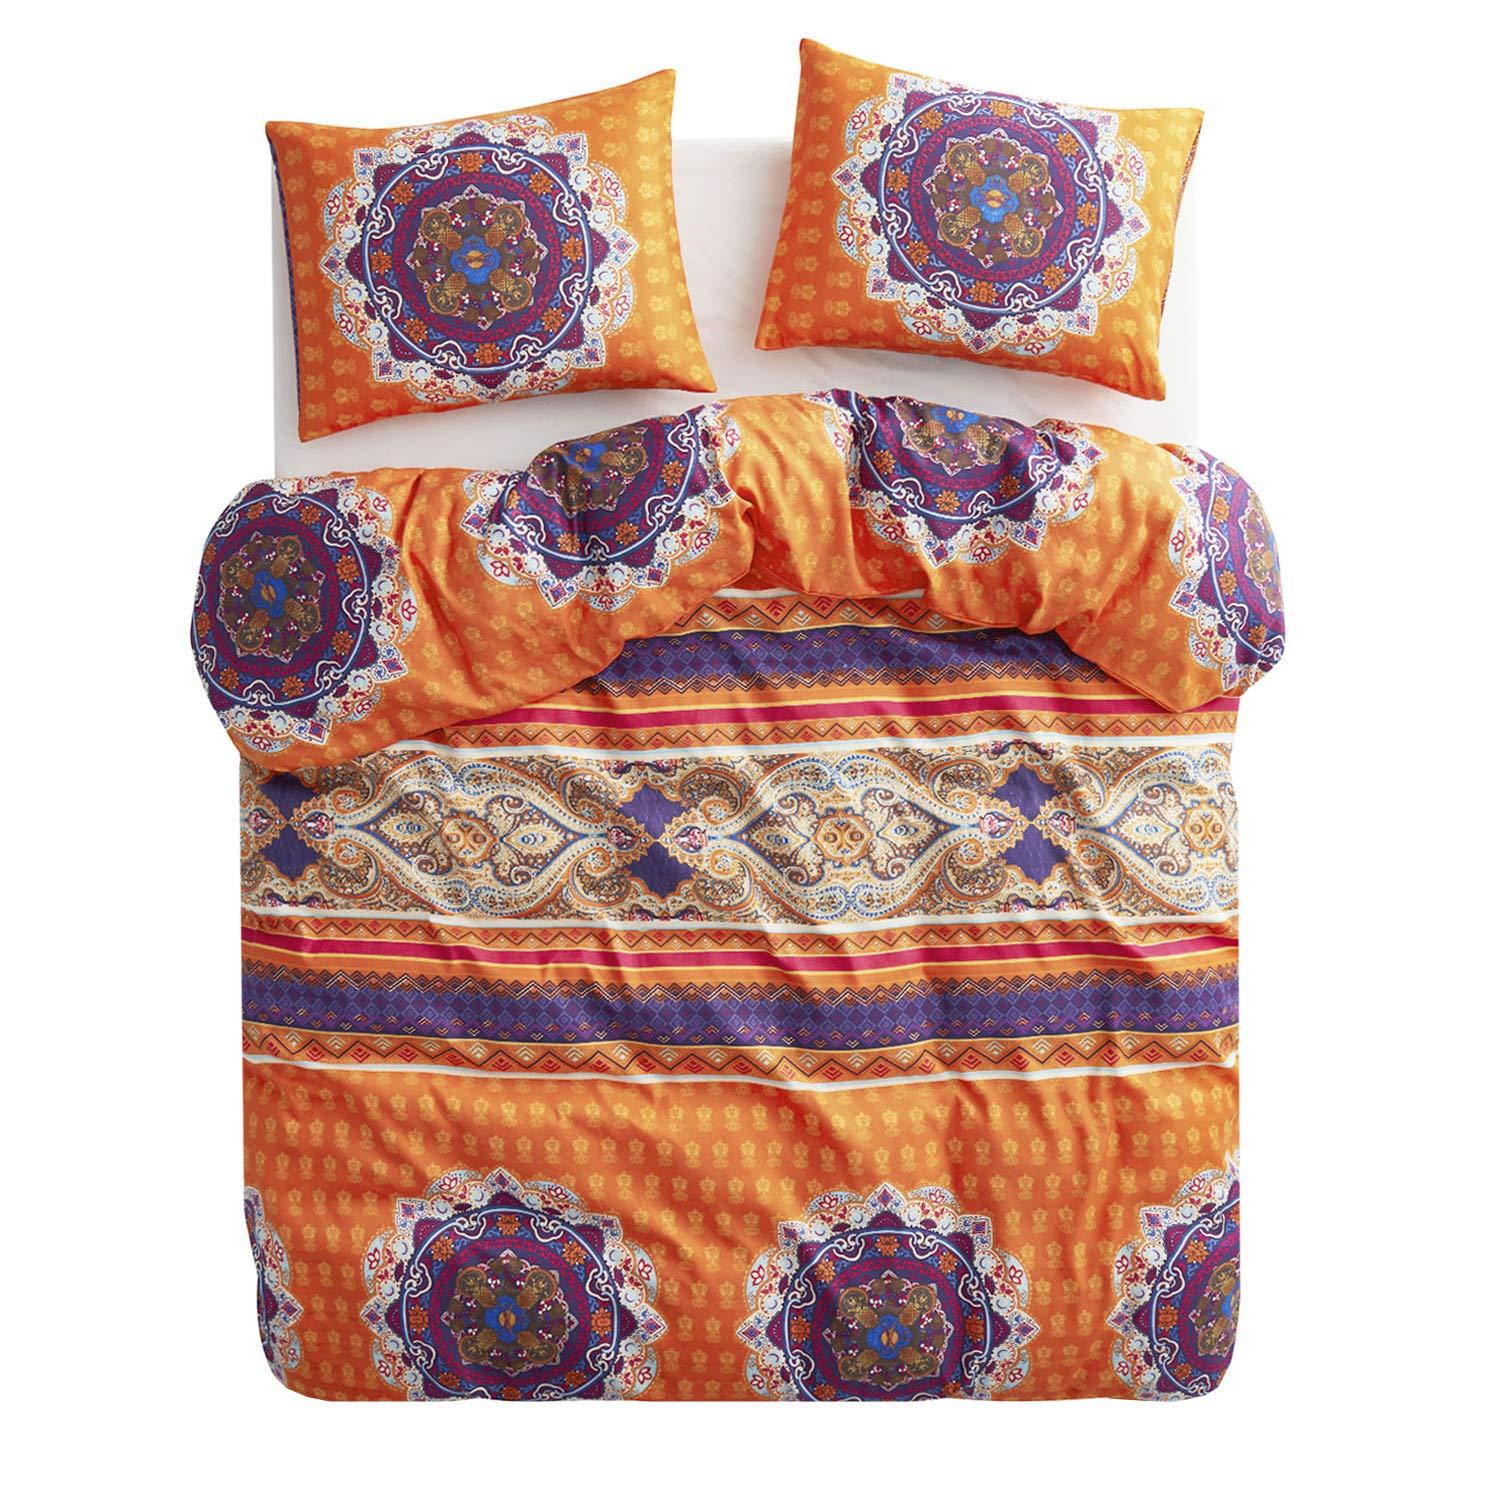 Wake In Cloud - Bohemian Duvet Cover Set, Orange Boho Chic Mandala Medallion Printed Soft Microfiber Bedding, with Zipper Closure (3pcs, King Size)